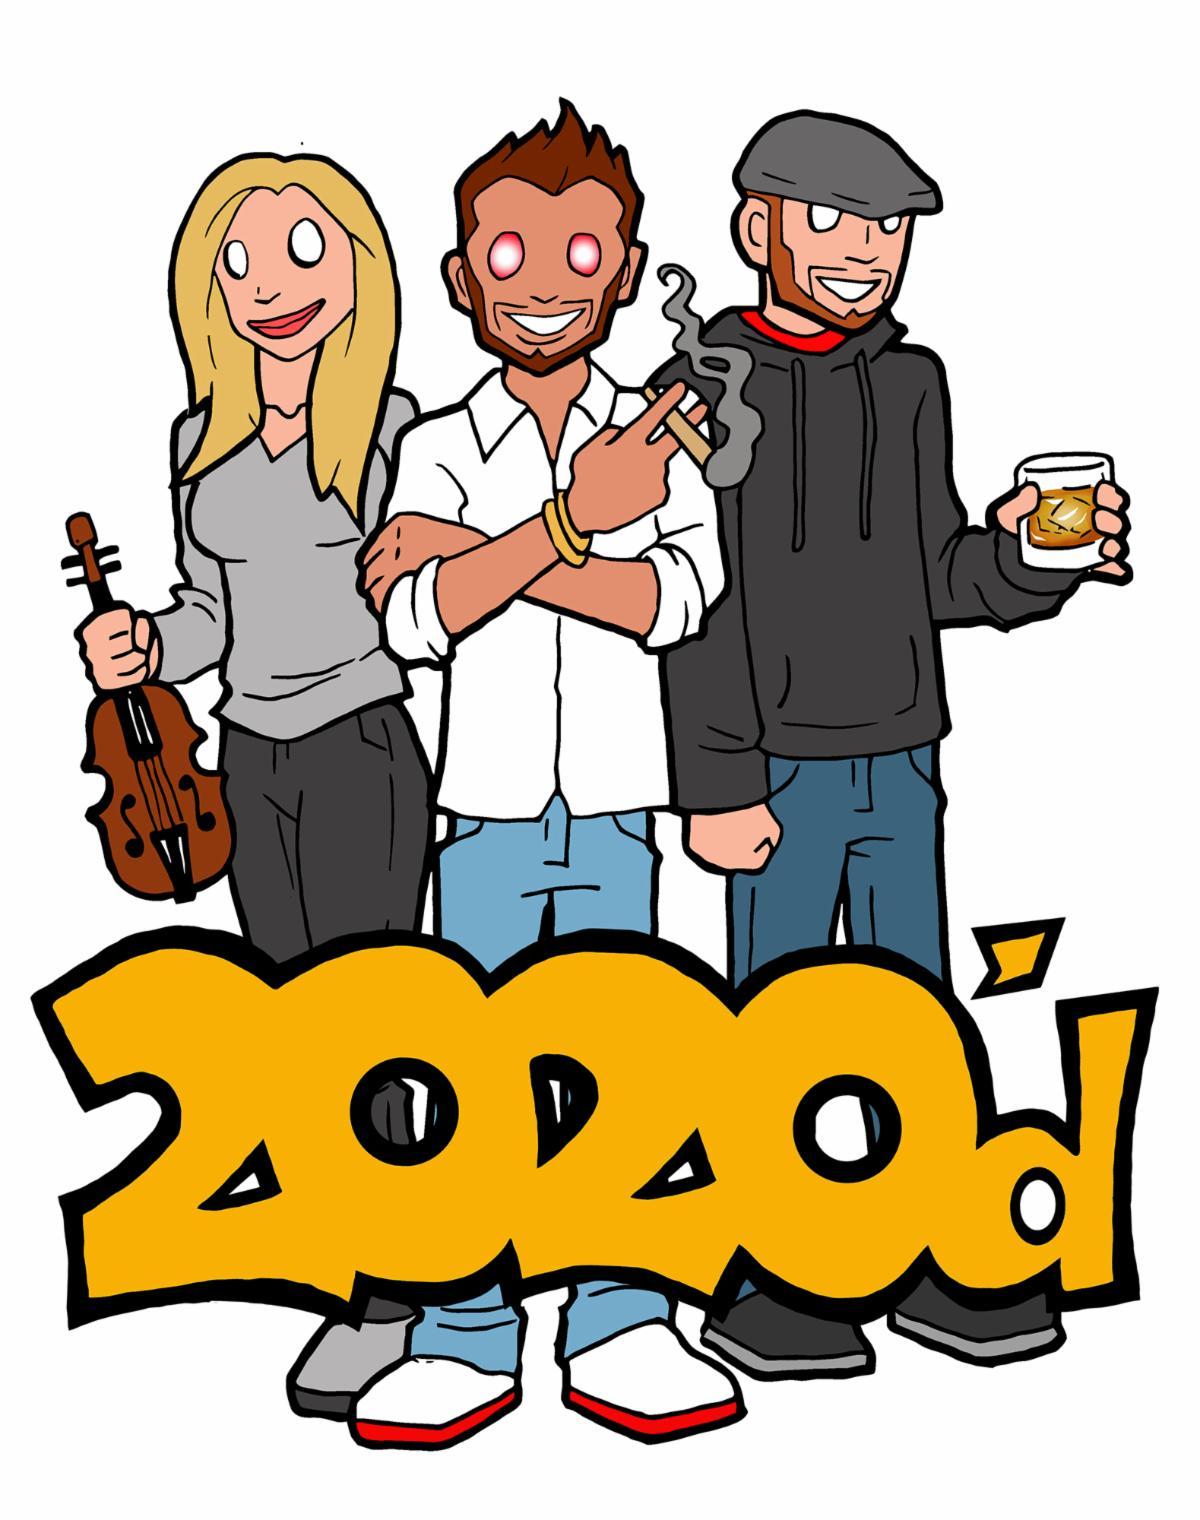 Lost Symphony 2020'd Podcast